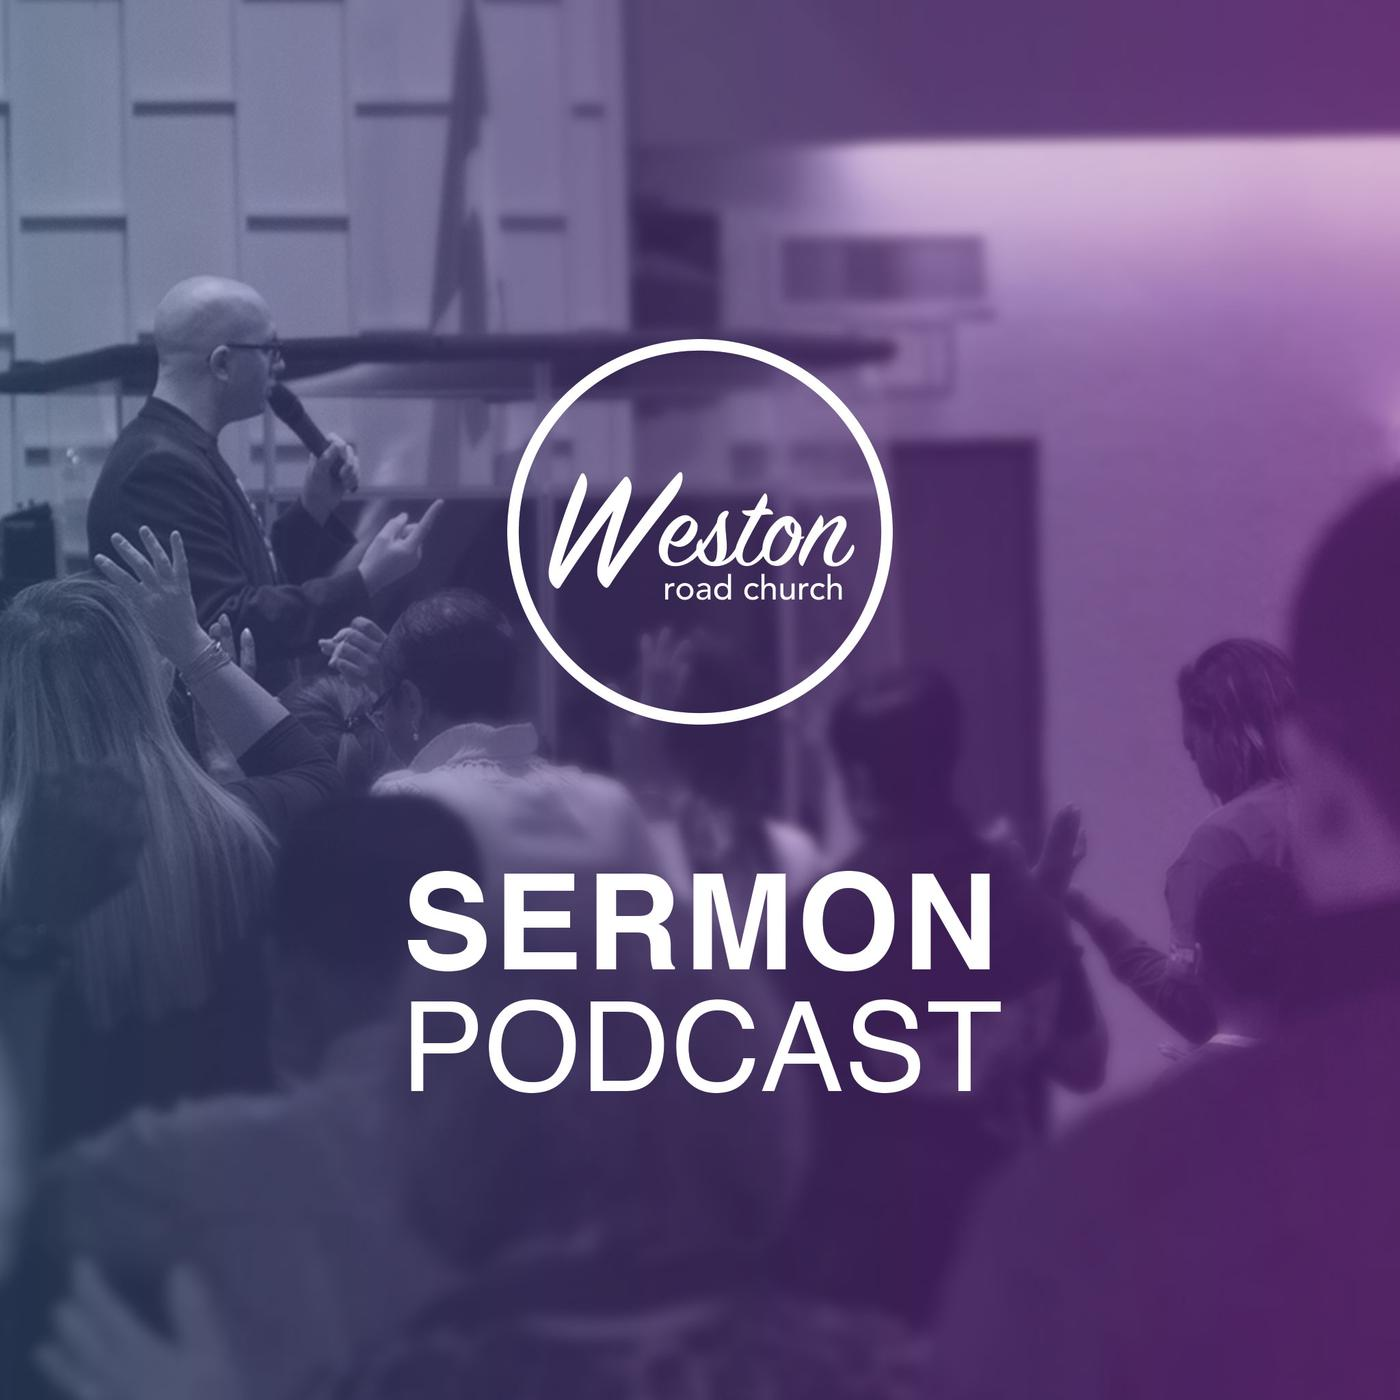 Weston Road Pentecostal Church: Sermon Podcast - westonroadchurch